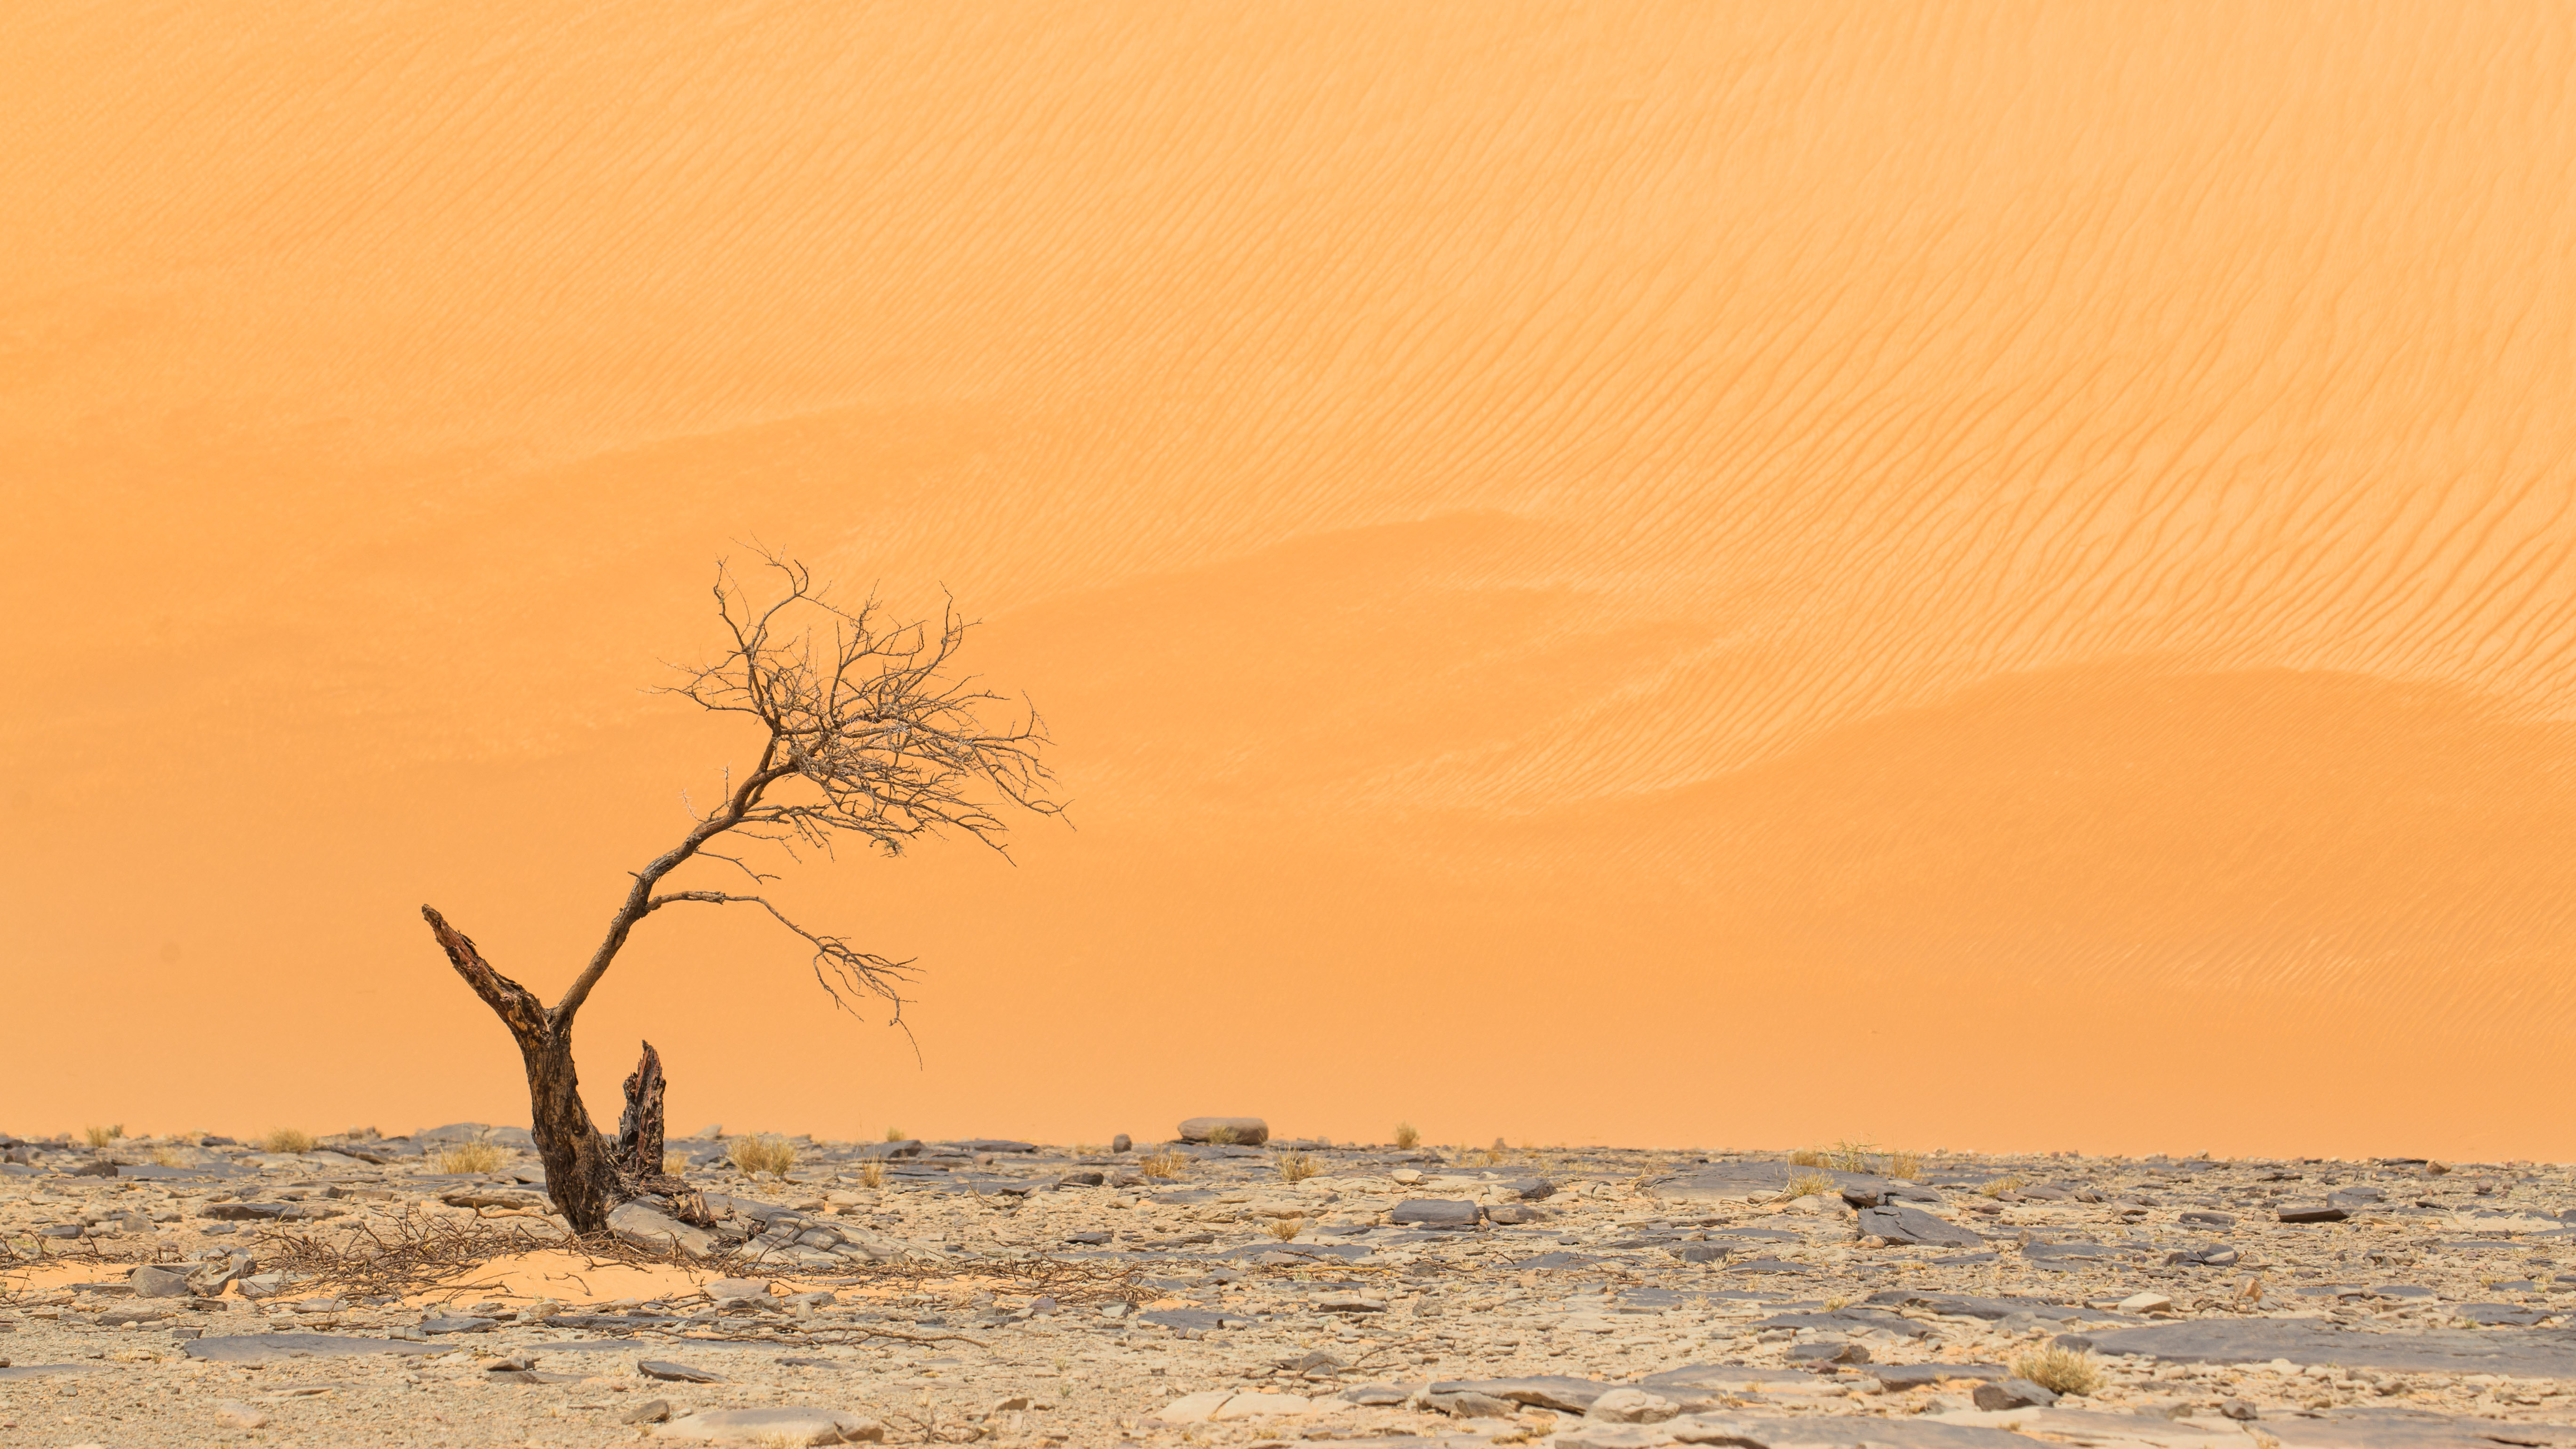 Acacia au pied du mont Zarga